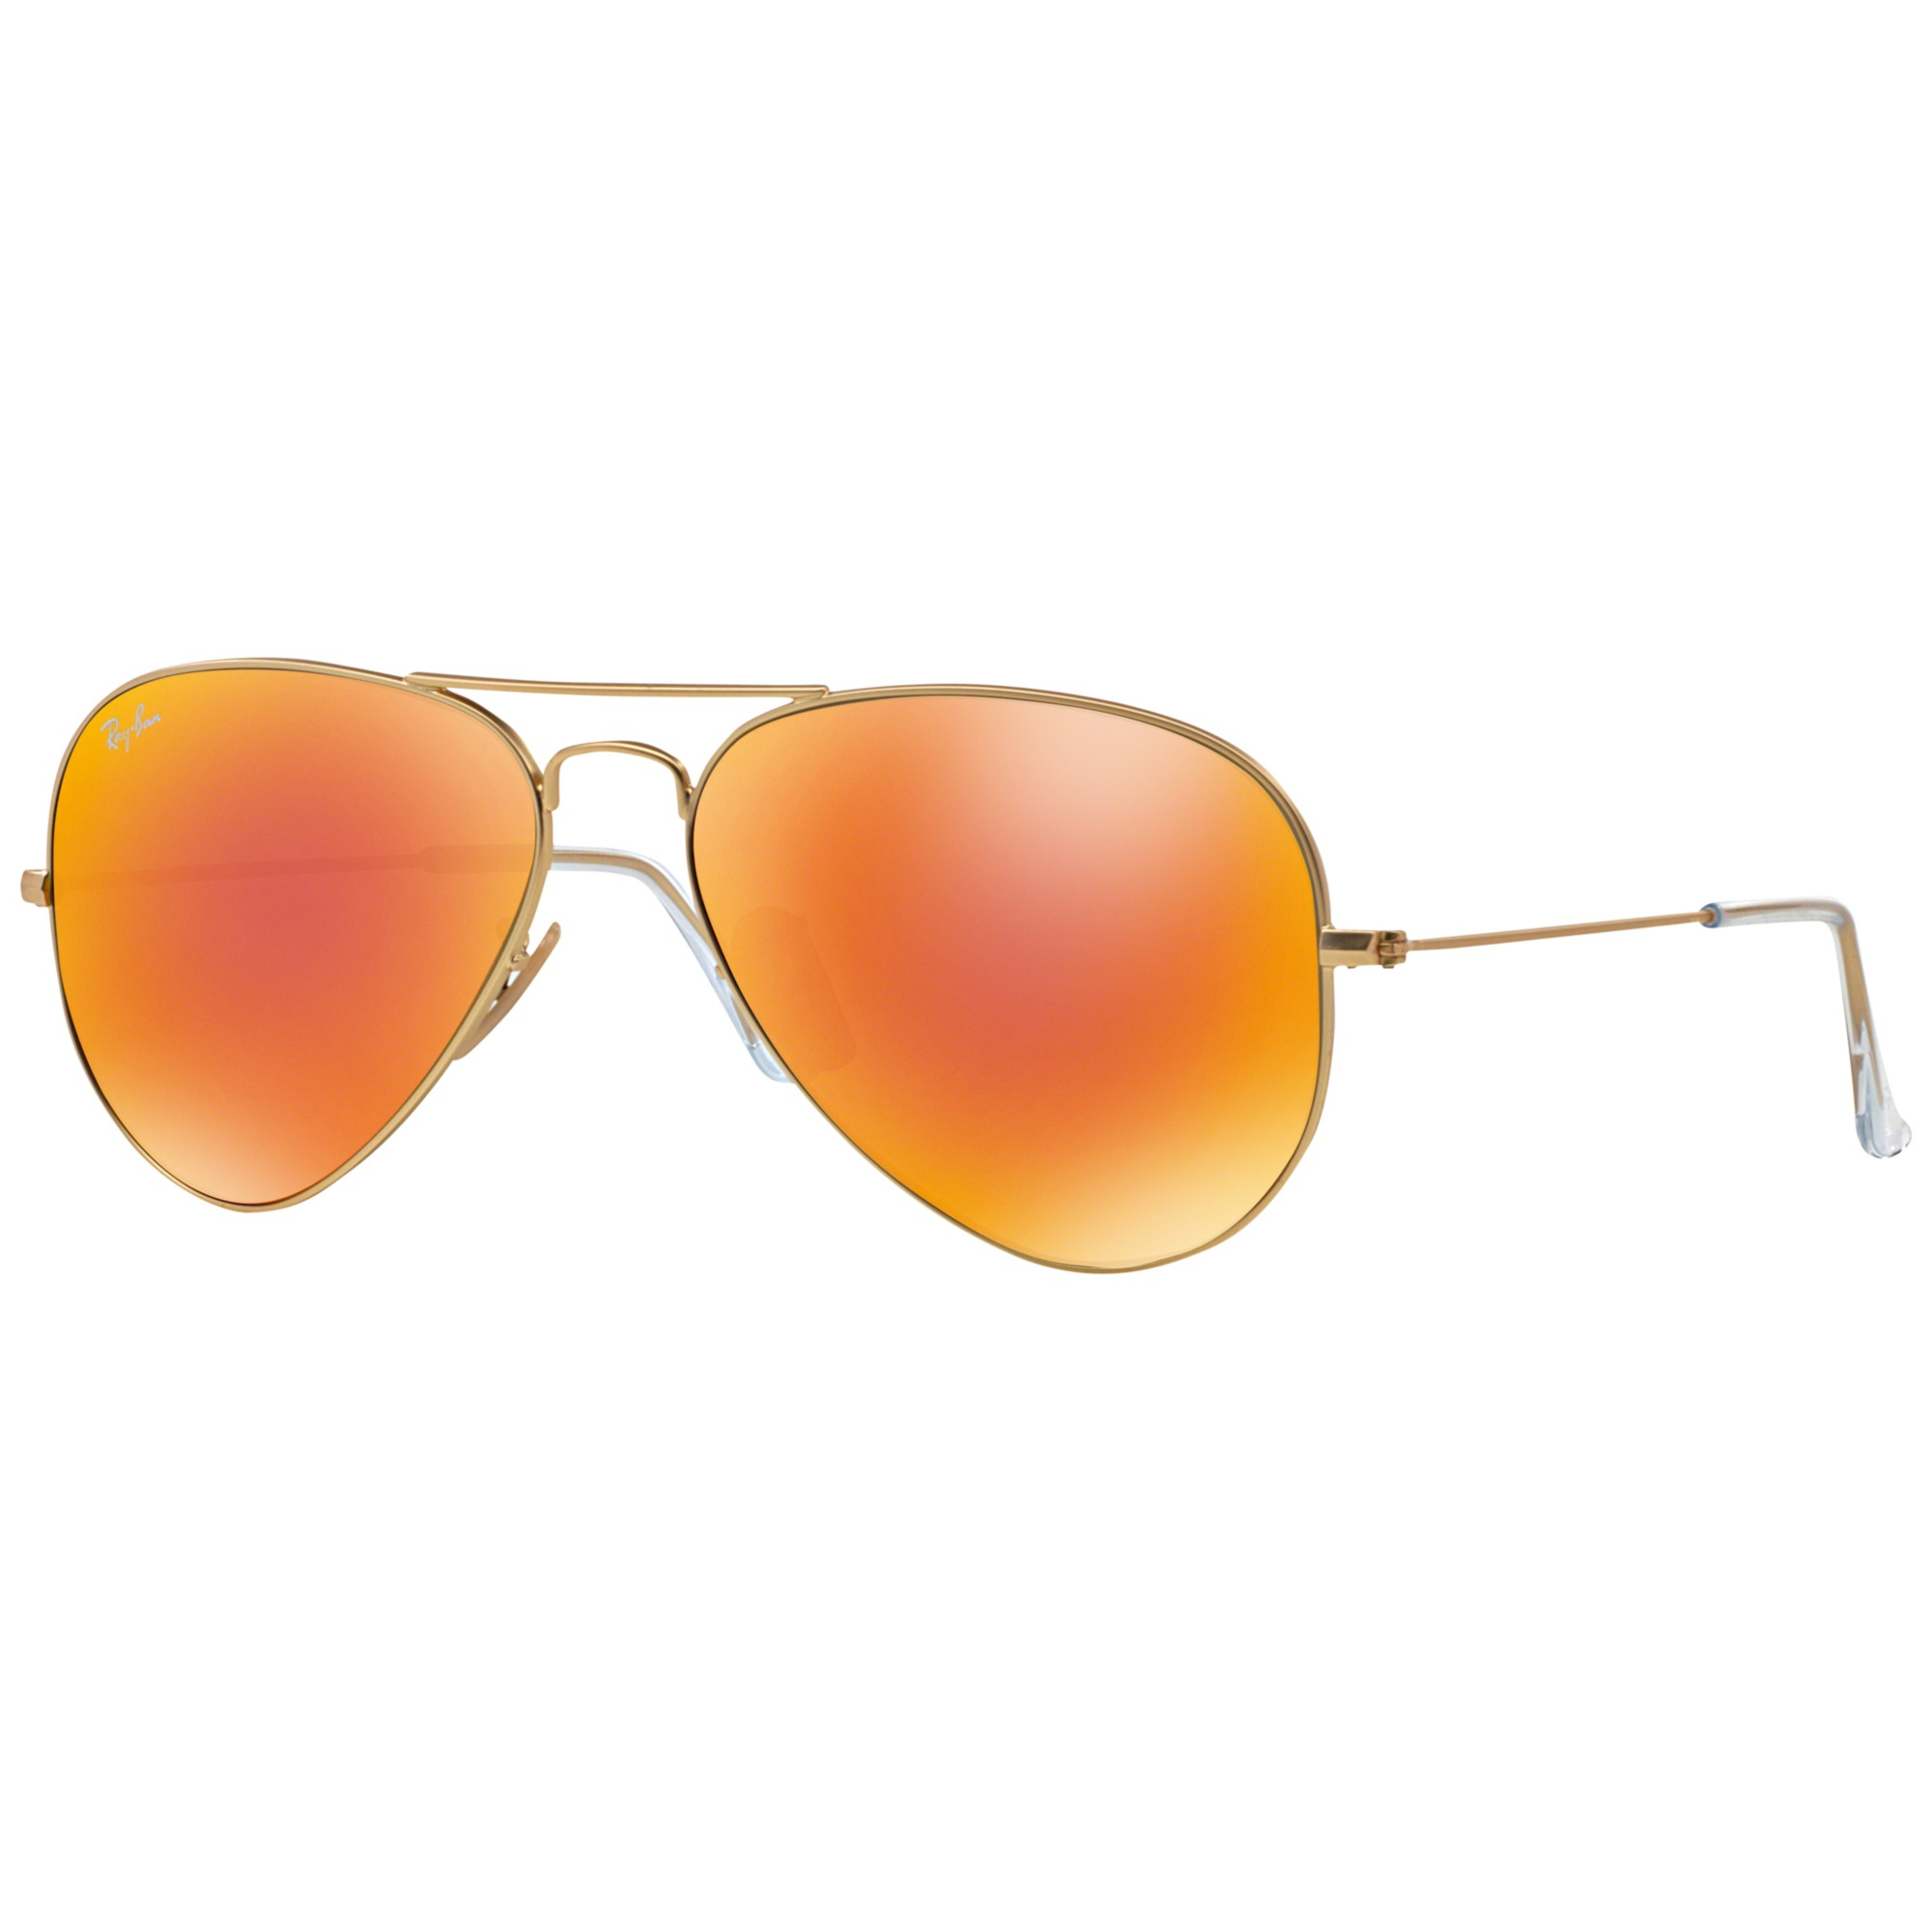 6ff49c12c0401 Ray-Ban Rb3025 Aviator Sunglasses in Orange for Men - Lyst